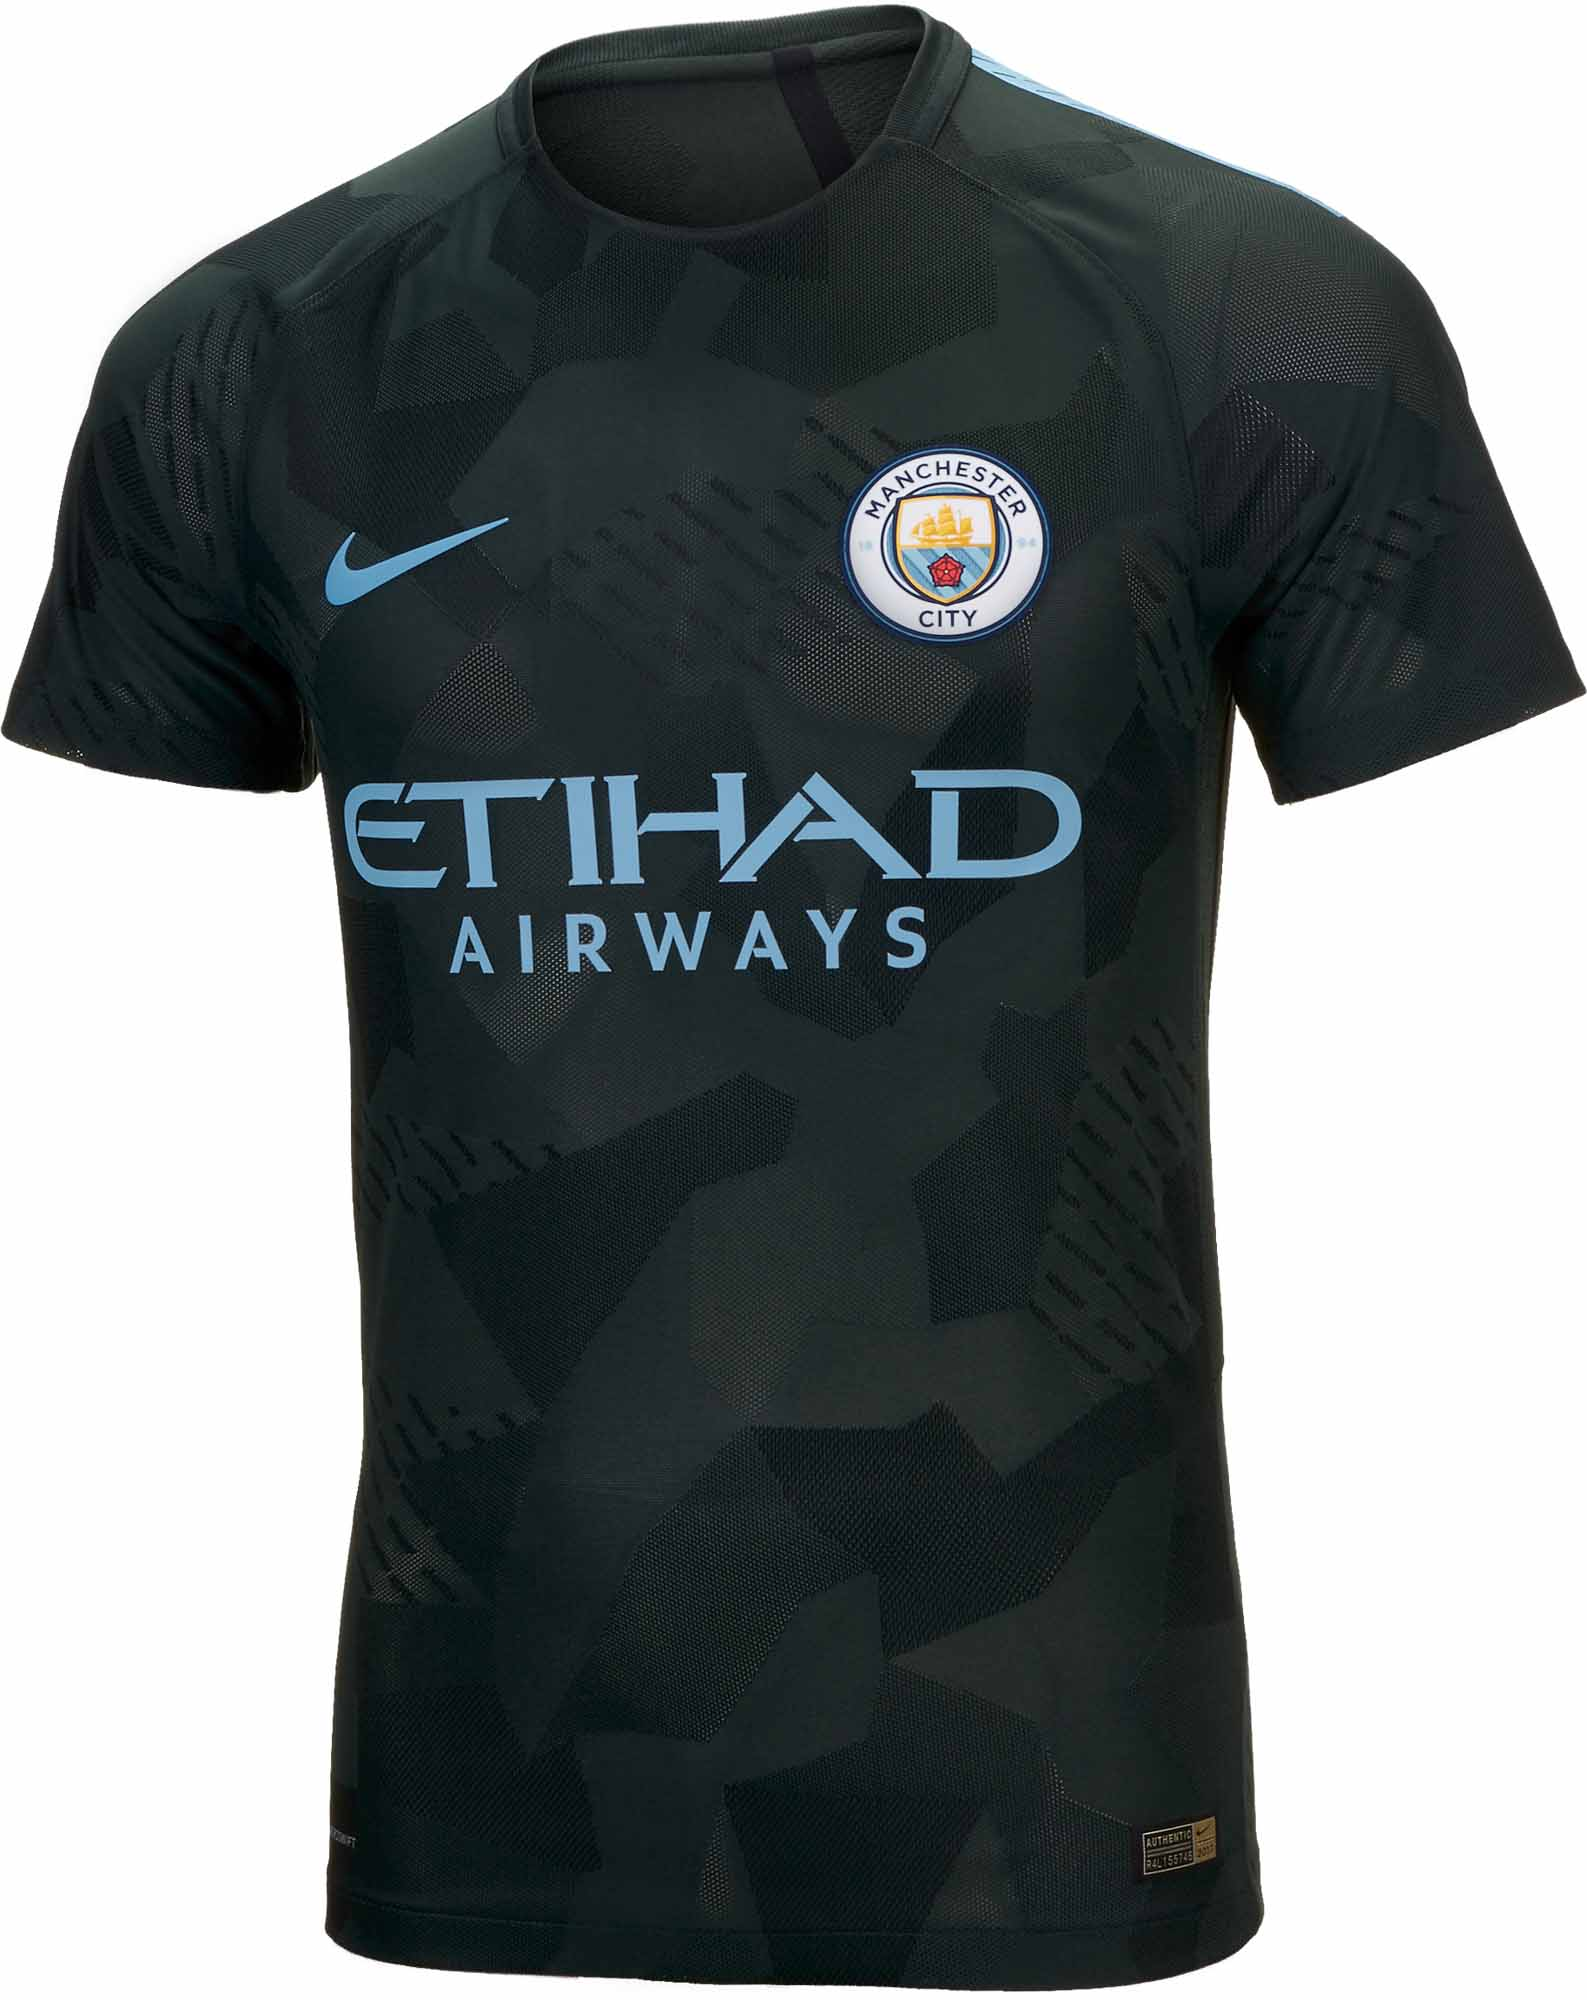 Nike Manchester City 3rd Match Jersey 2017-18 NS - Soccer ...